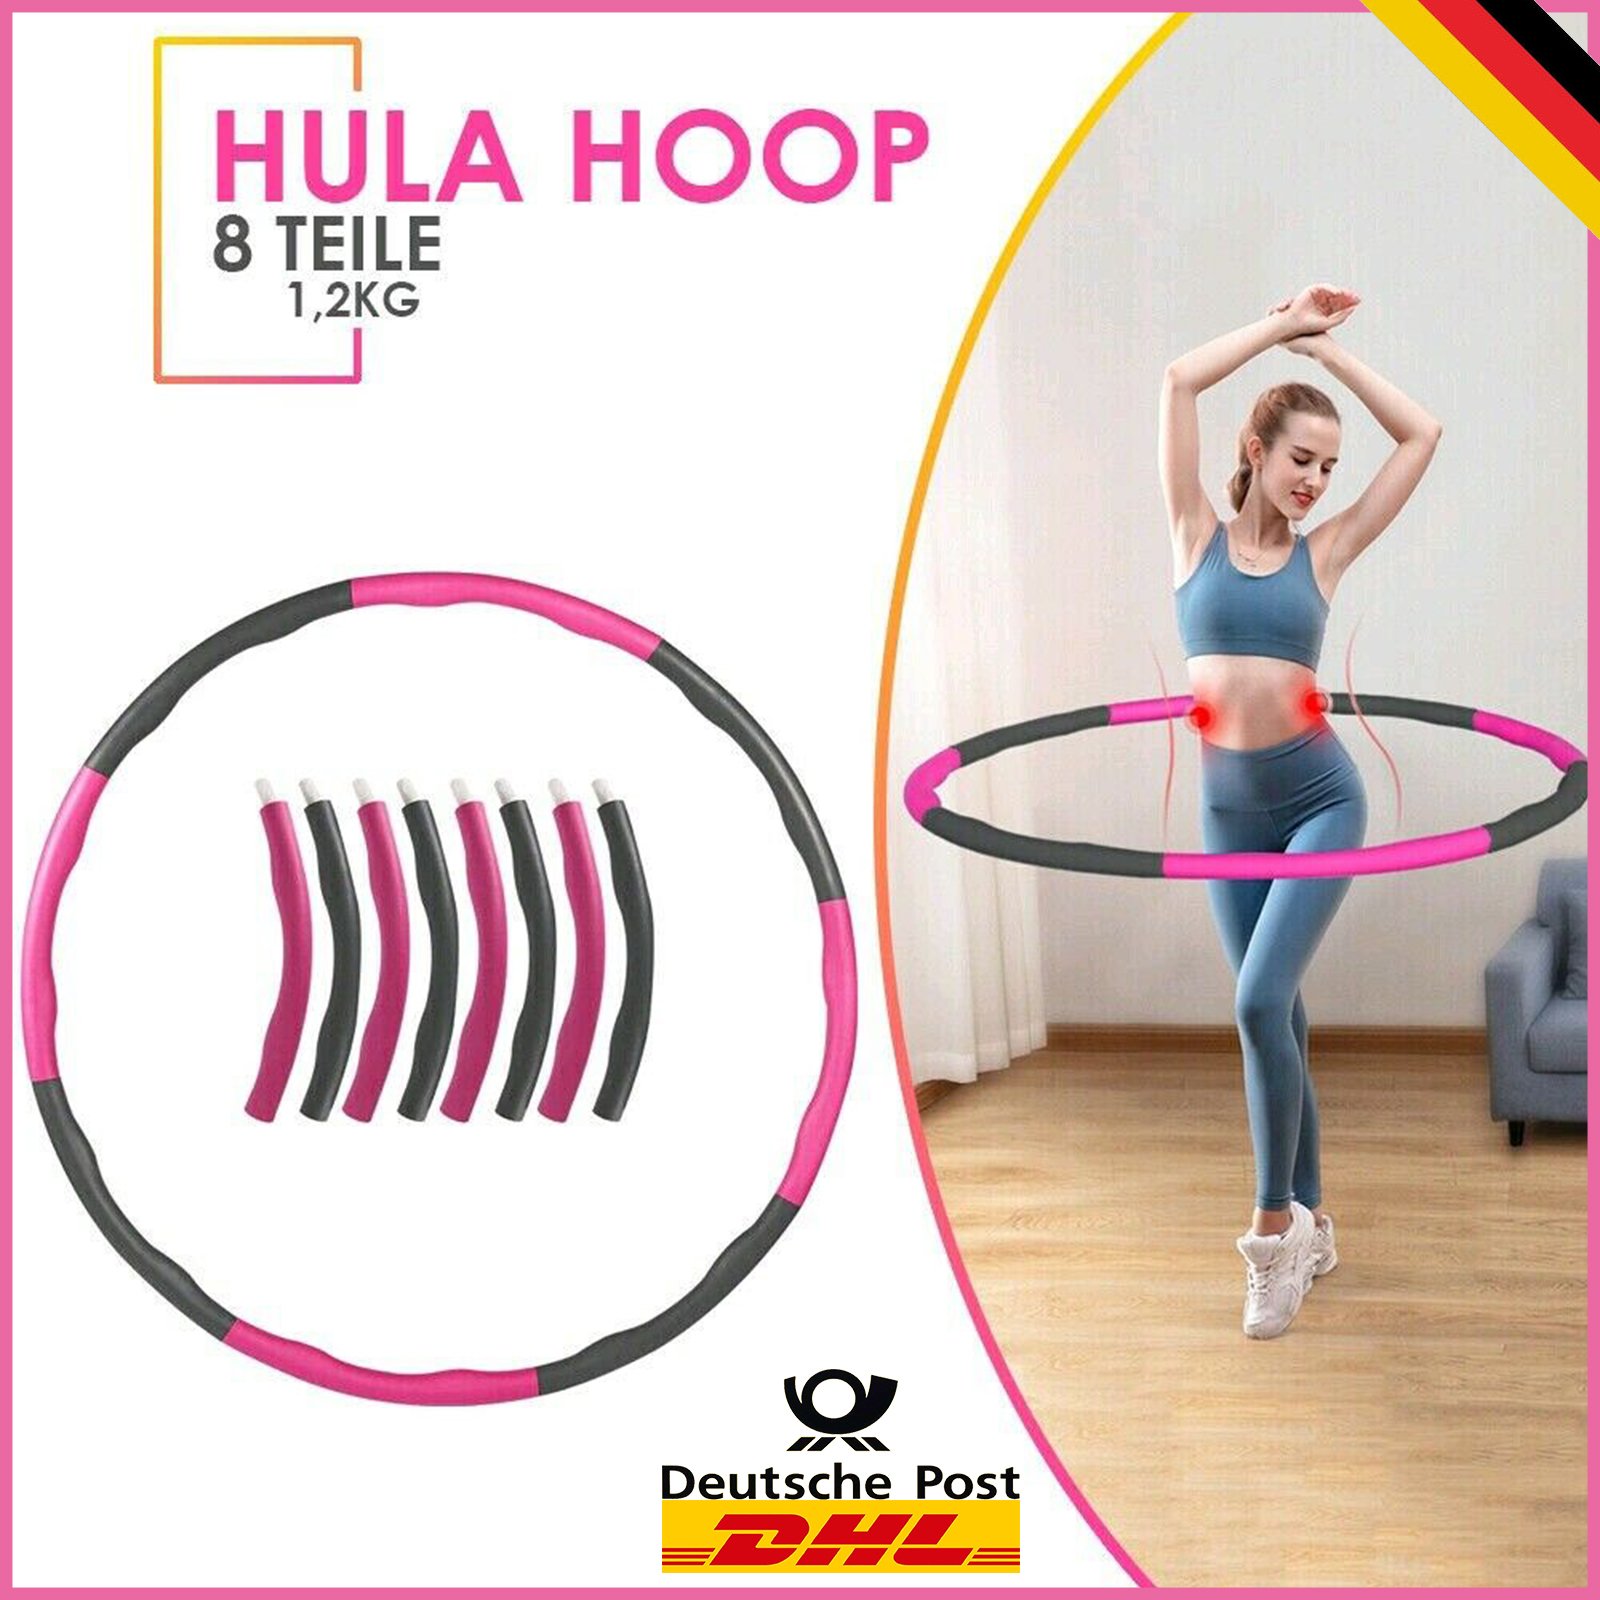 8 Teile Hula Hoop Reifen Fitnesstraining Sport Einstellbar Gewichthula Gymnastik